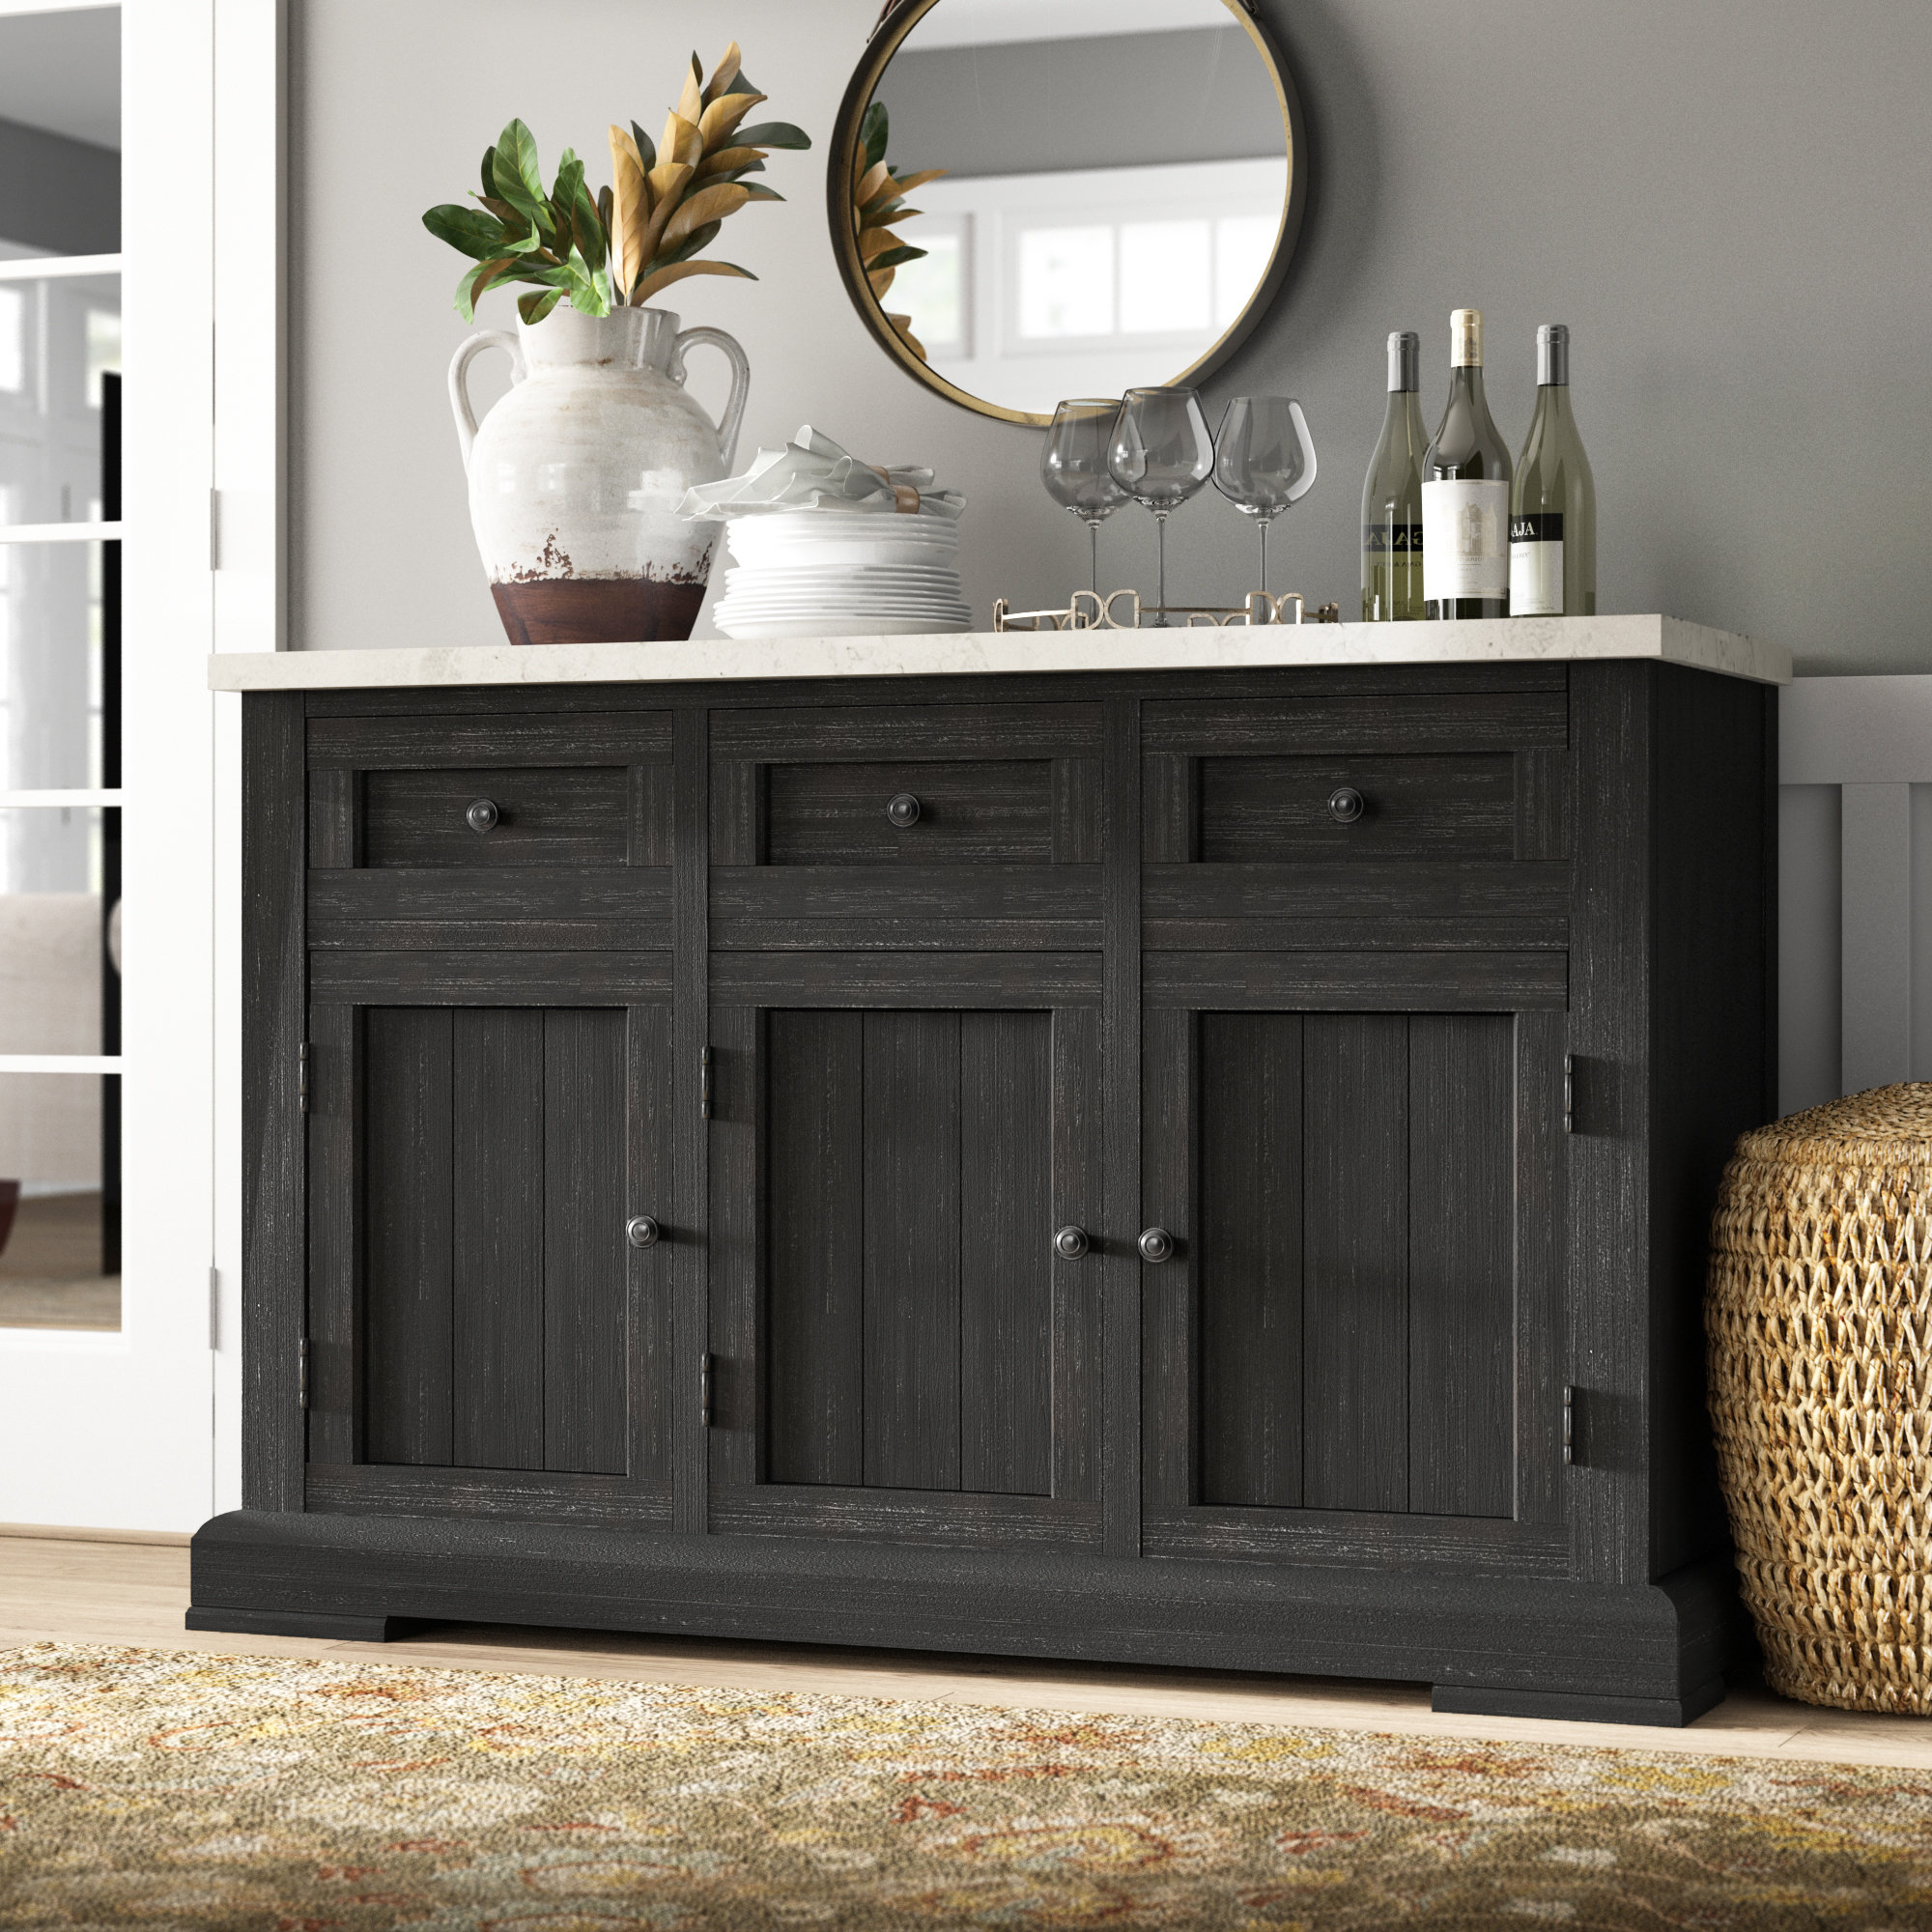 Amityville Wood Sideboard | Wayfair.ca for Amityville Wood Sideboards (Image 12 of 30)